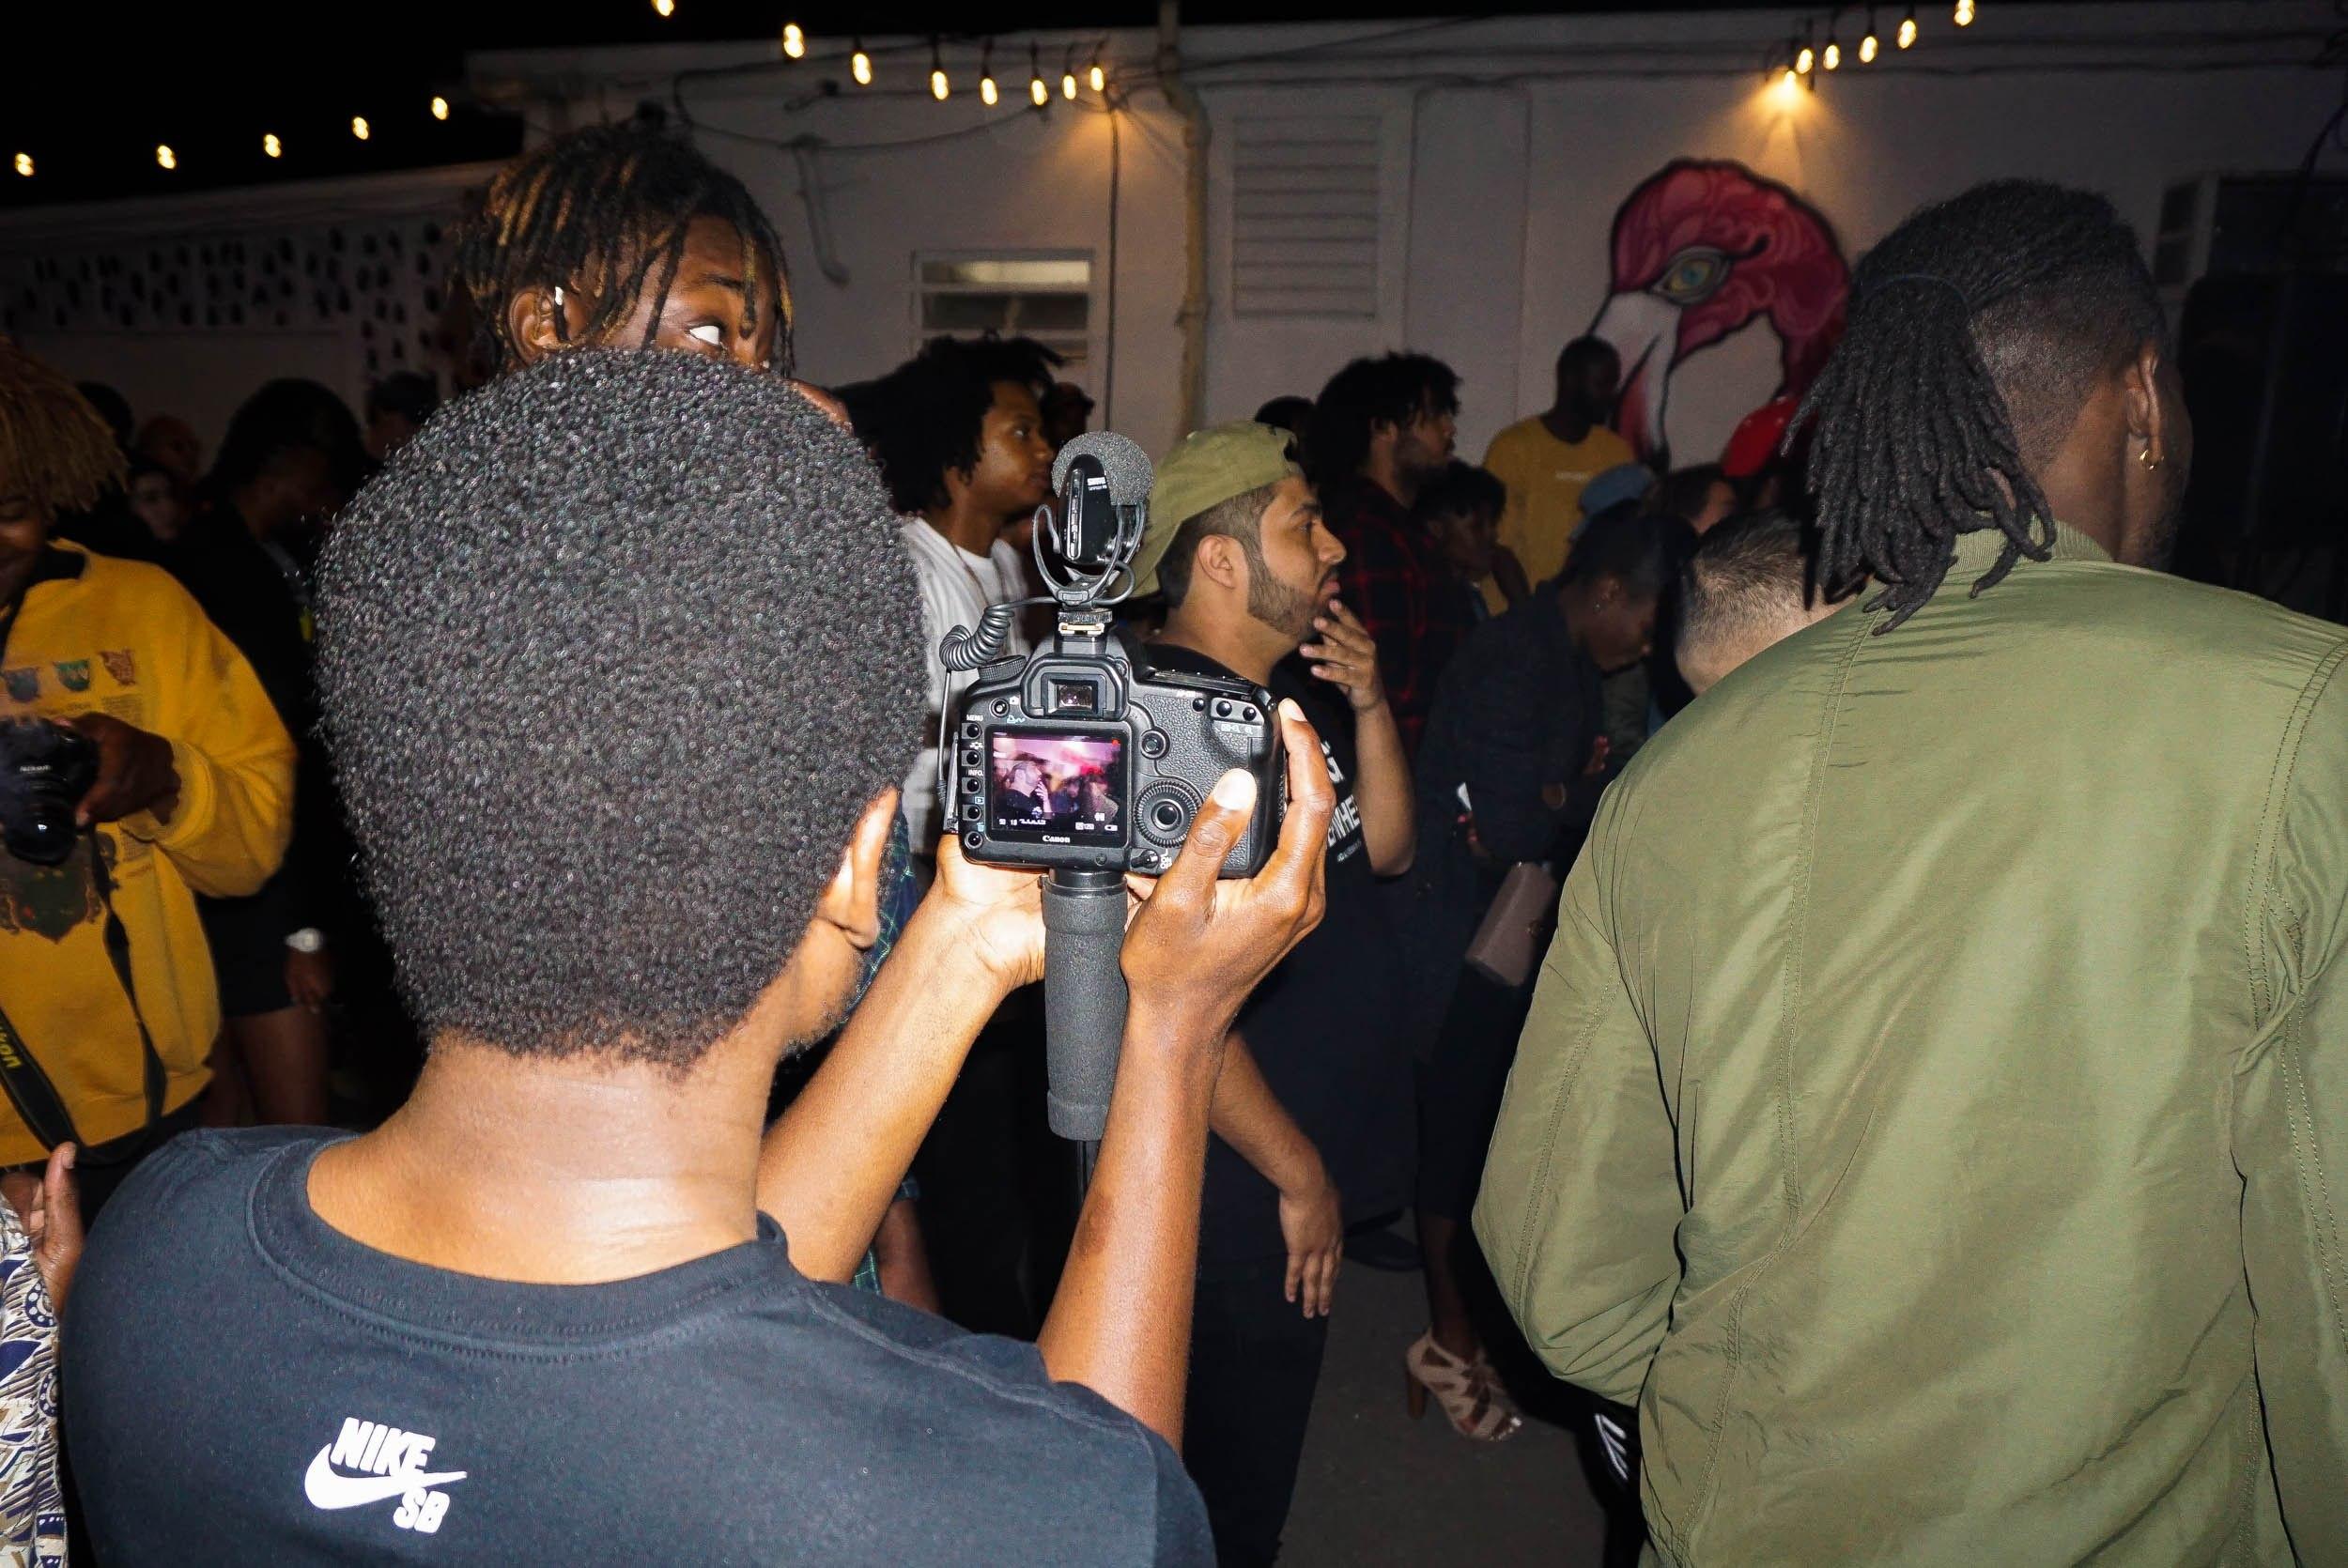 Harryson Thevenin / SR50 Interview | Orlando music blog Art Interviews | The Vinyl Warhol